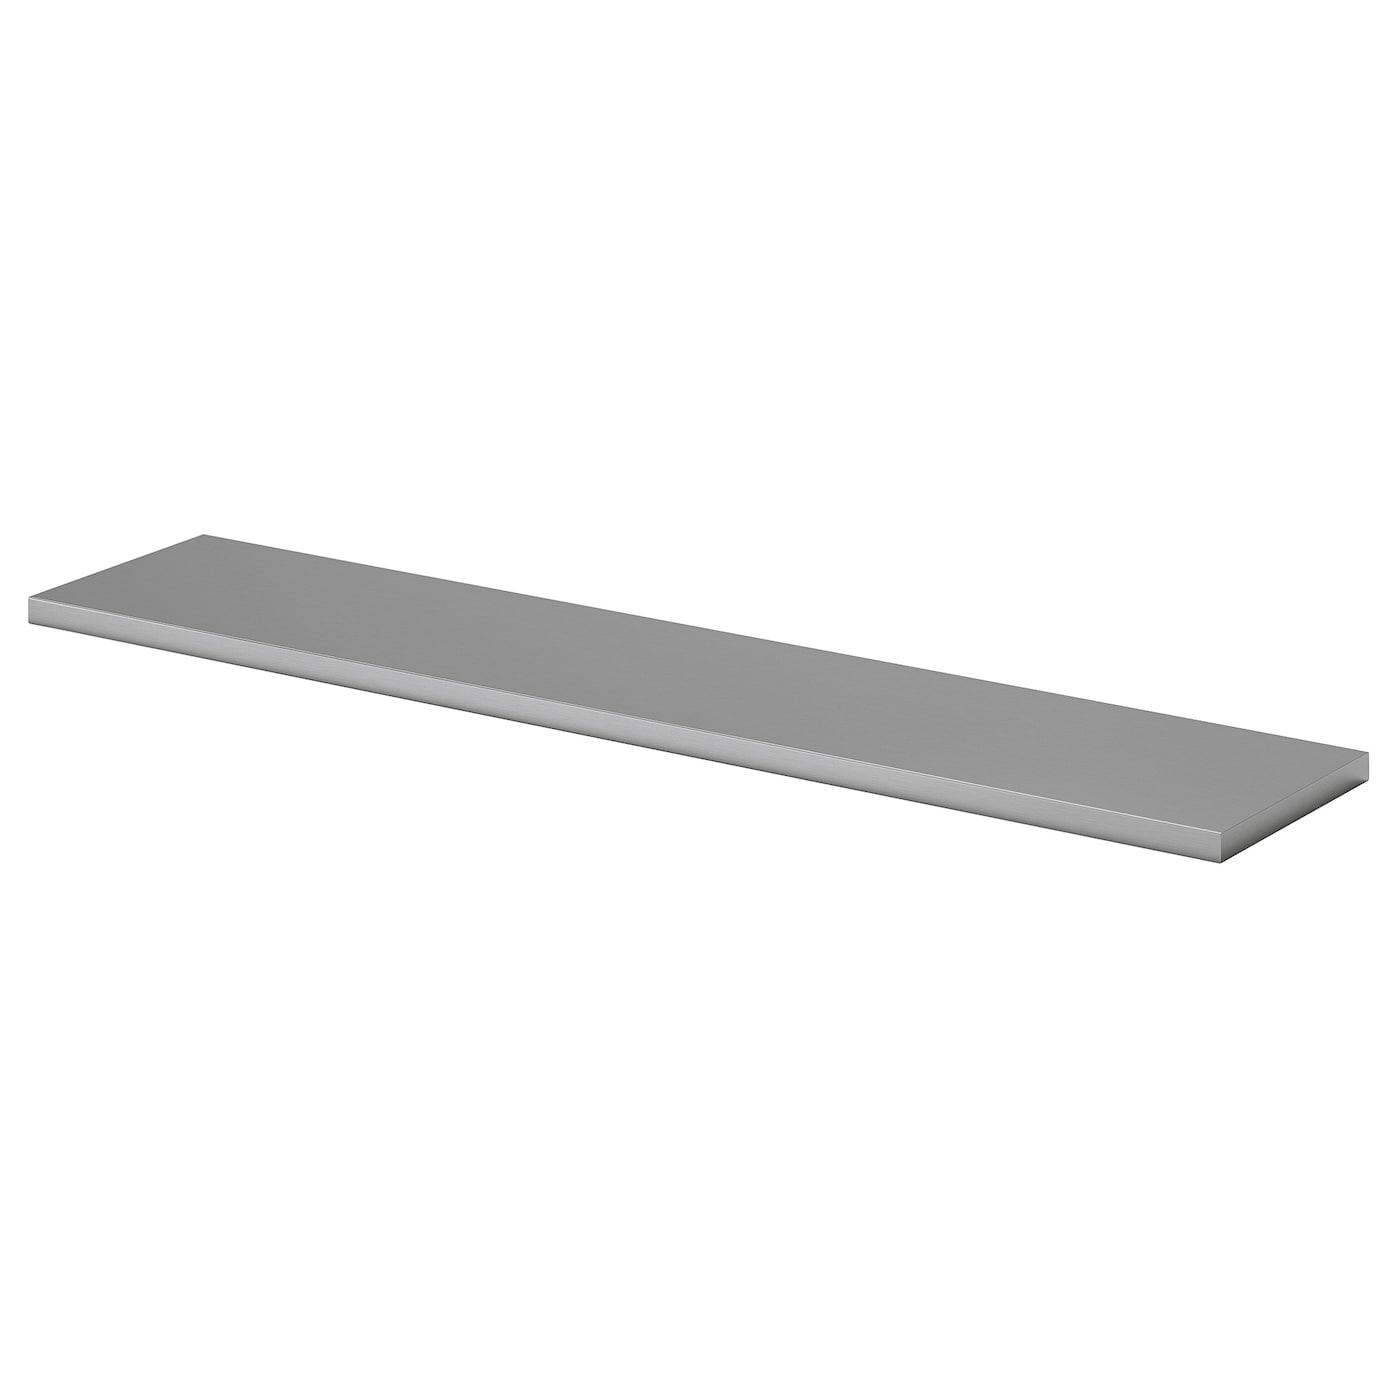 IKEA EKBY MOSSBY shelf